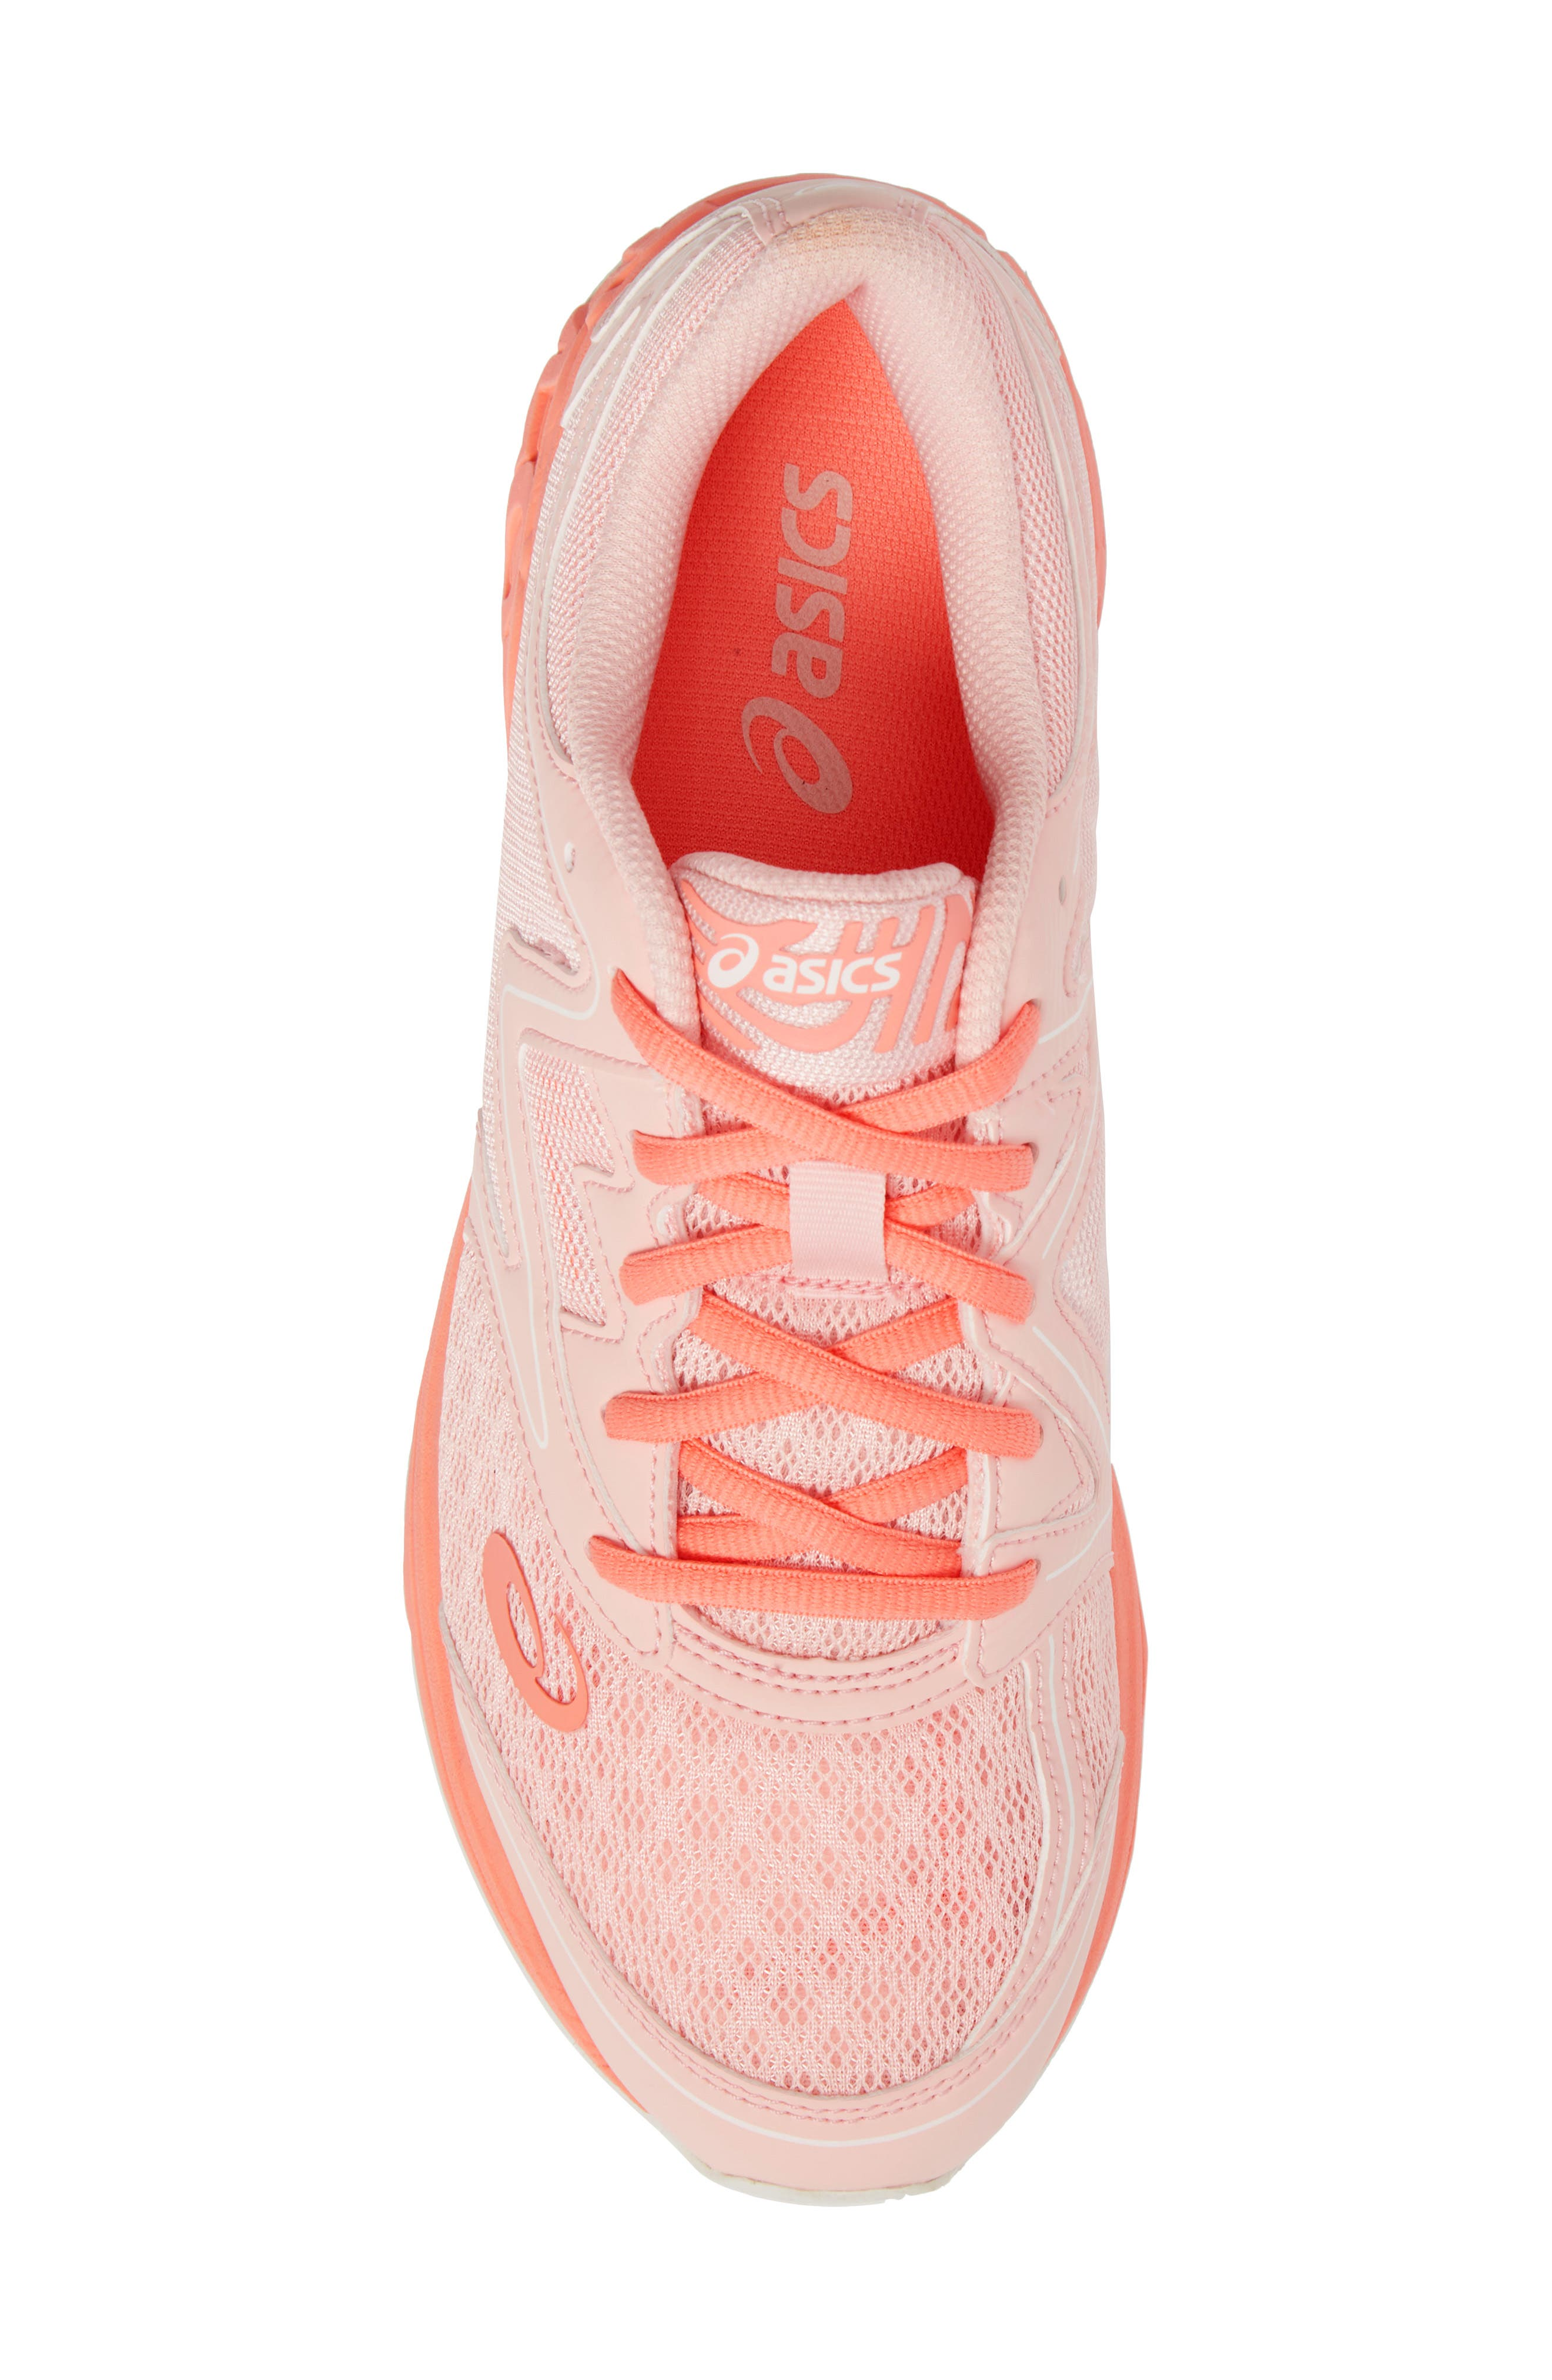 Noosa GS Sneaker,                             Alternate thumbnail 5, color,                             SEASHELL PINK/ BEGONIA/ WHITE